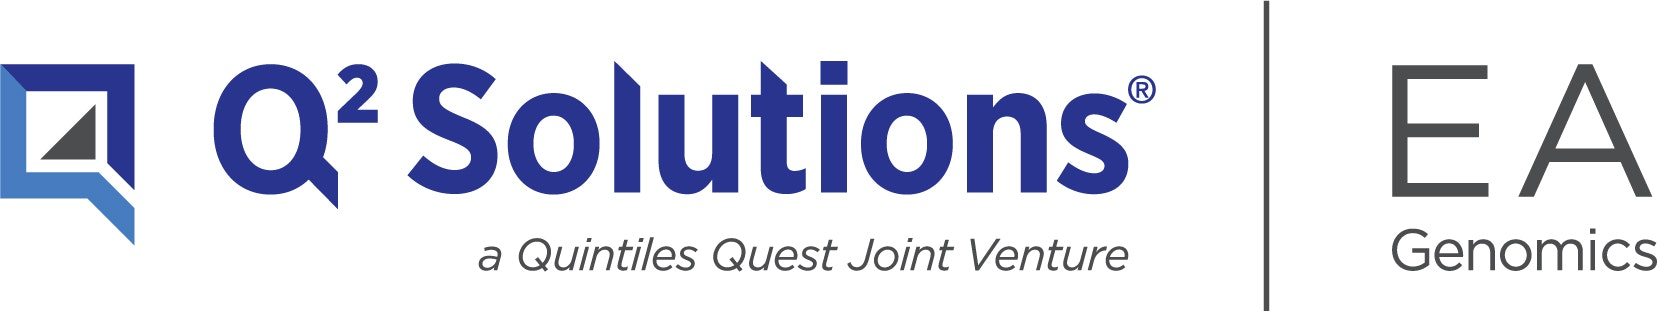 Yxd5sxp6rawhvtvn5sjn q2 solutions ea cobrand logo rgb.jpg